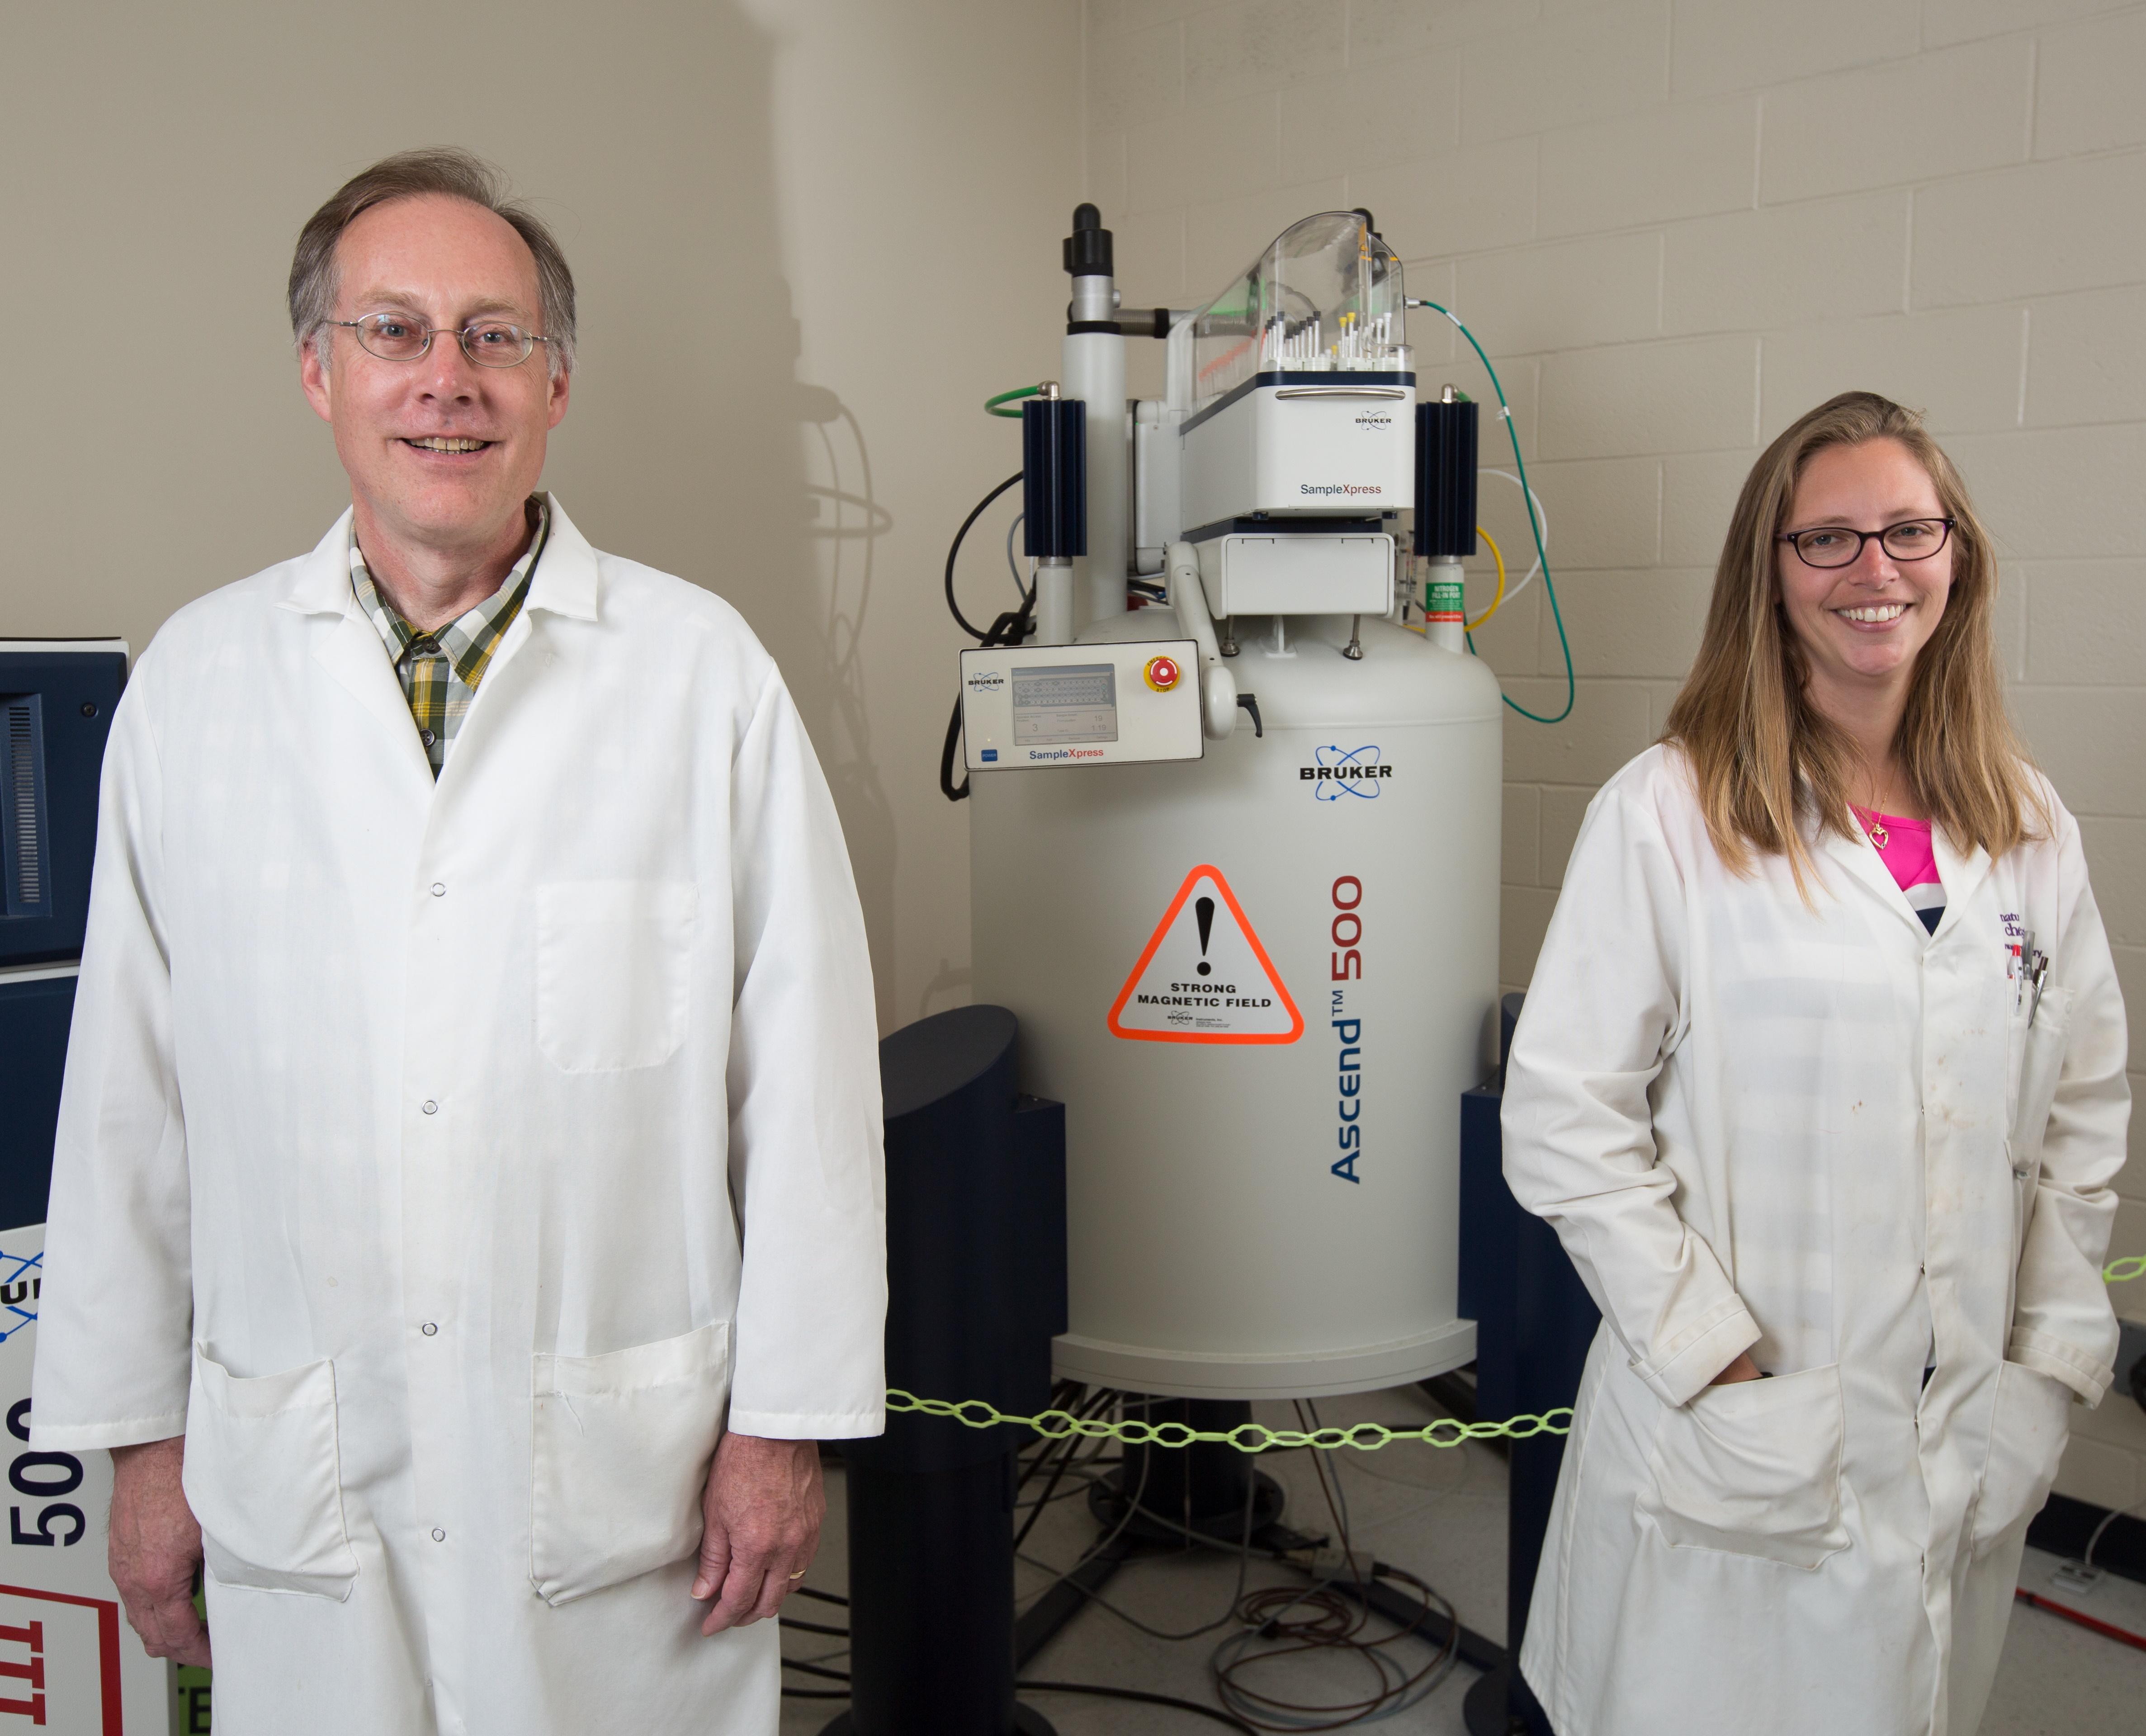 Brian Stockman, Ph.D. and Melissa VanAlstine-Parris, Ph.D.